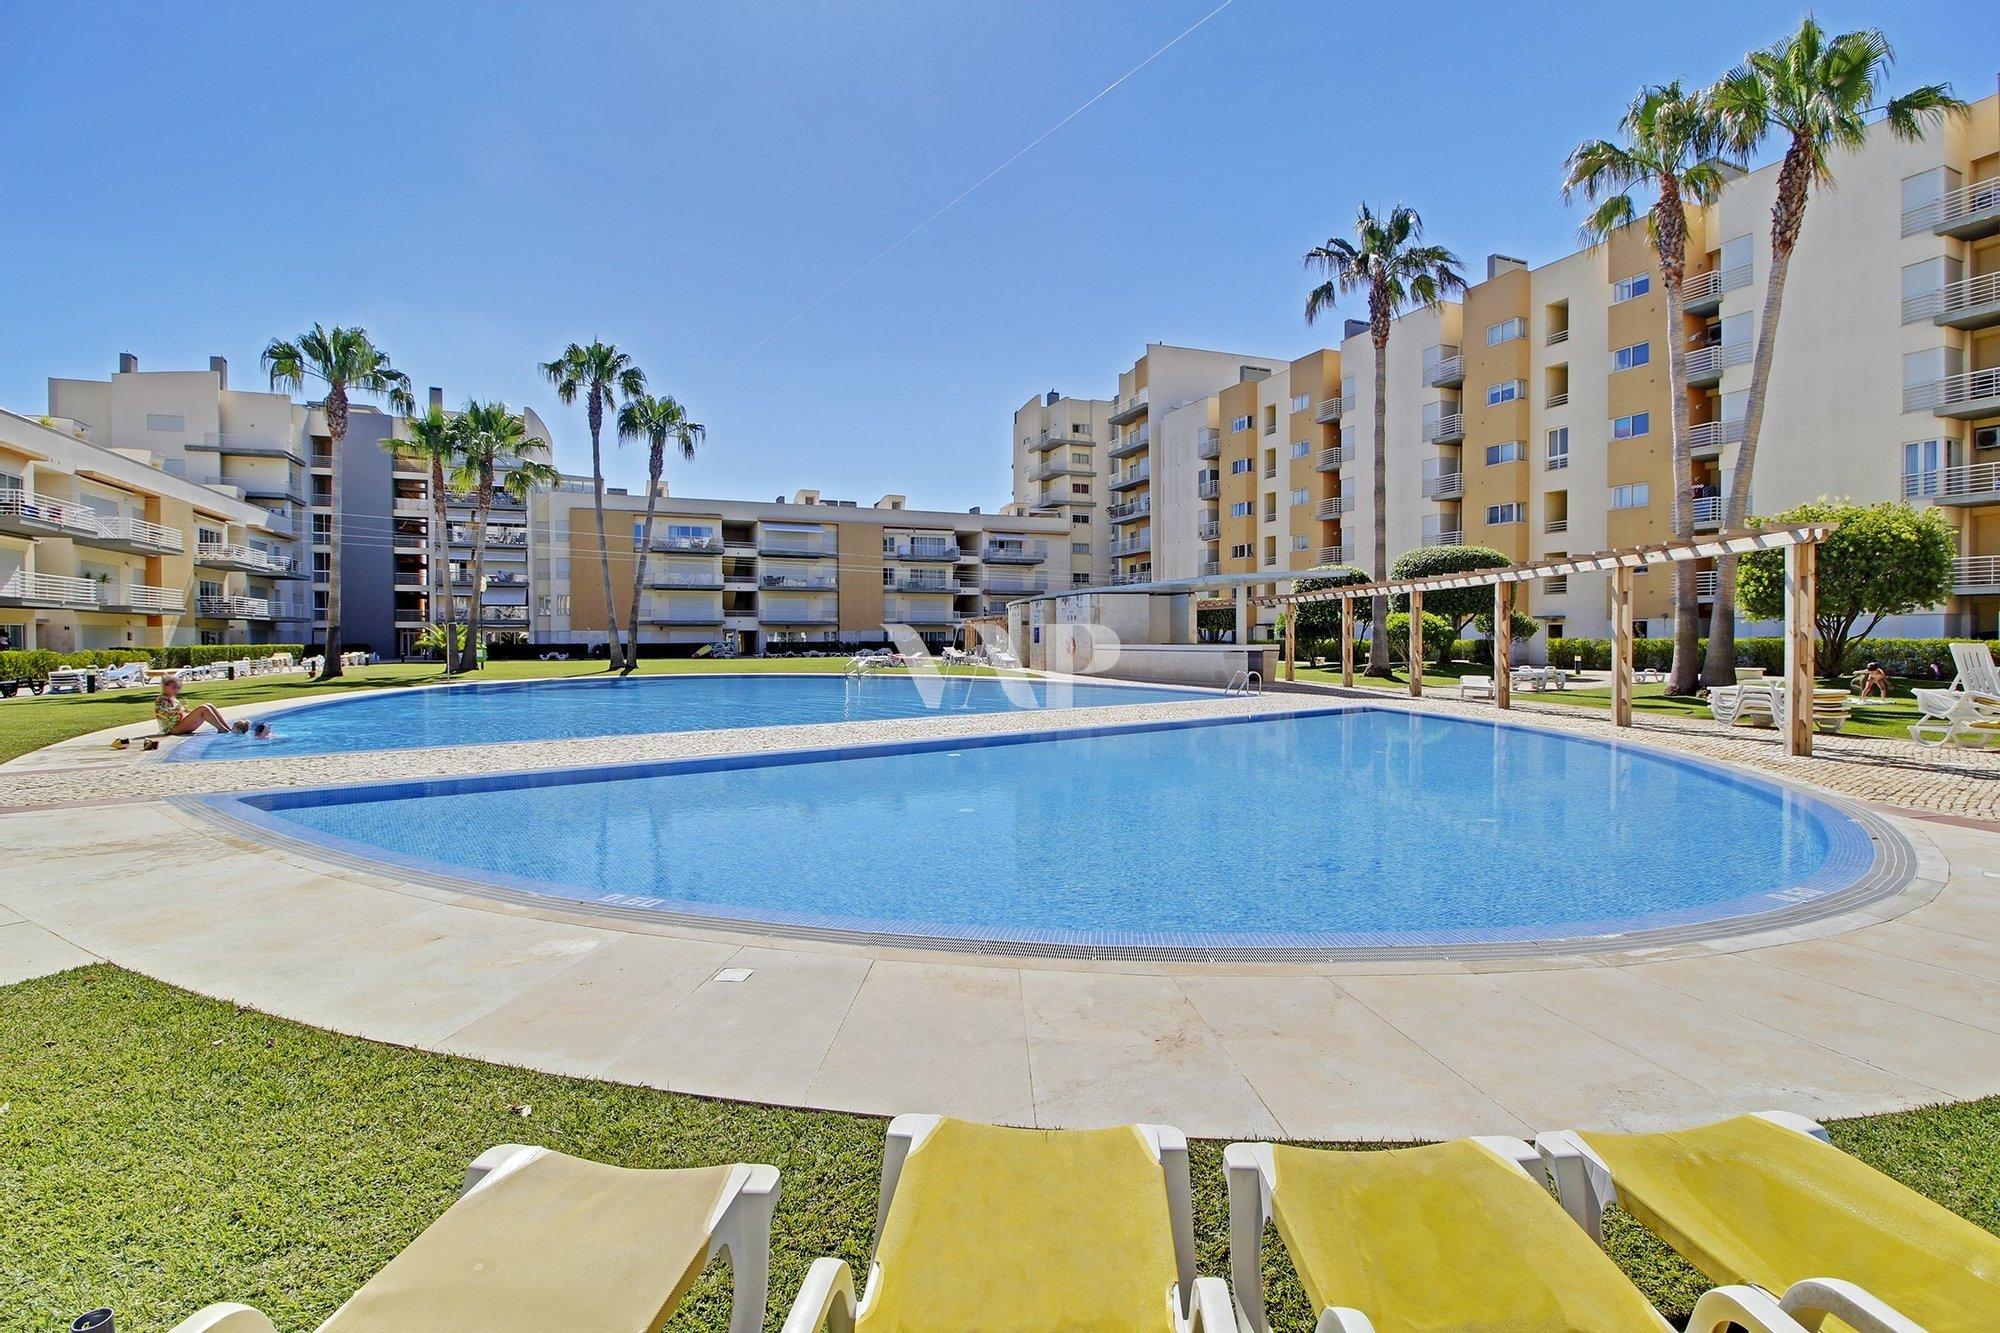 Apartment in Faro, Algarve, Portugal 1